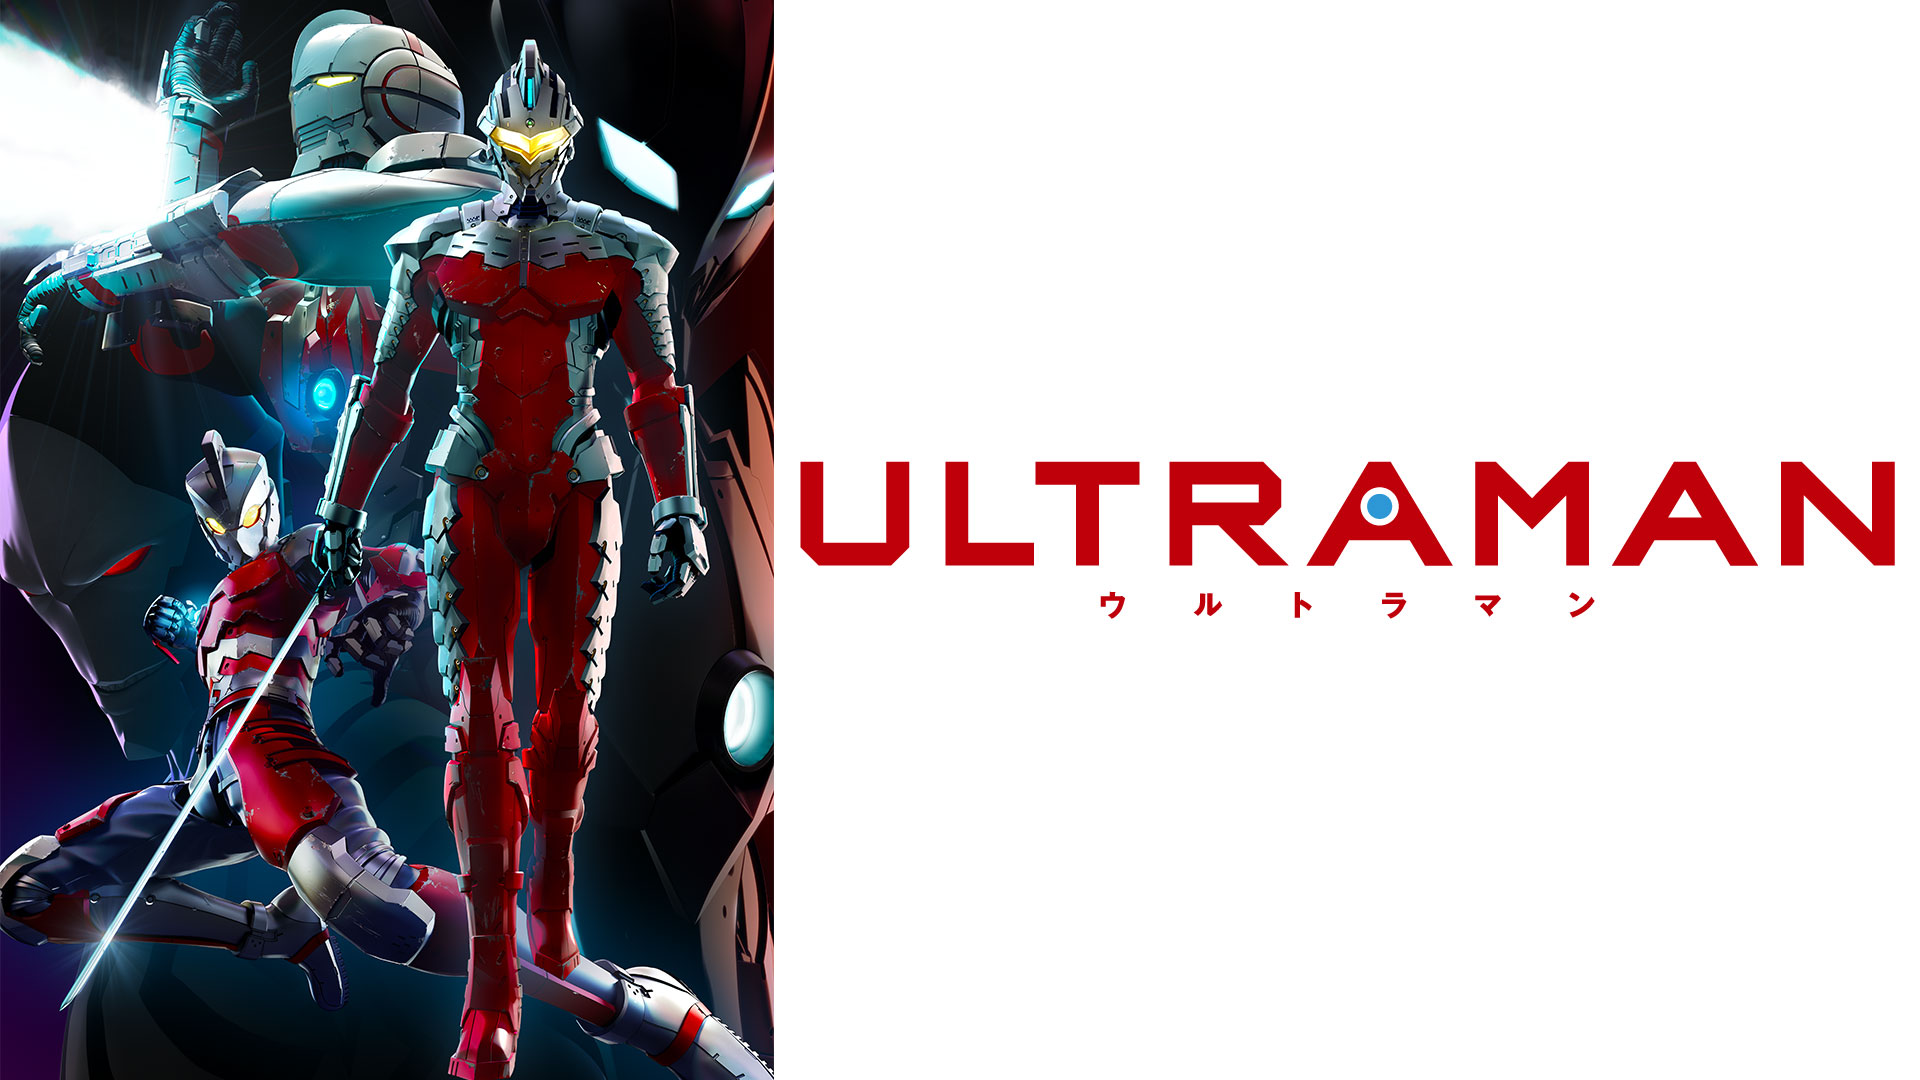 ULTRAMAN | 無料でアニメ動画&見逃し配信の全話フル視聴まとめ